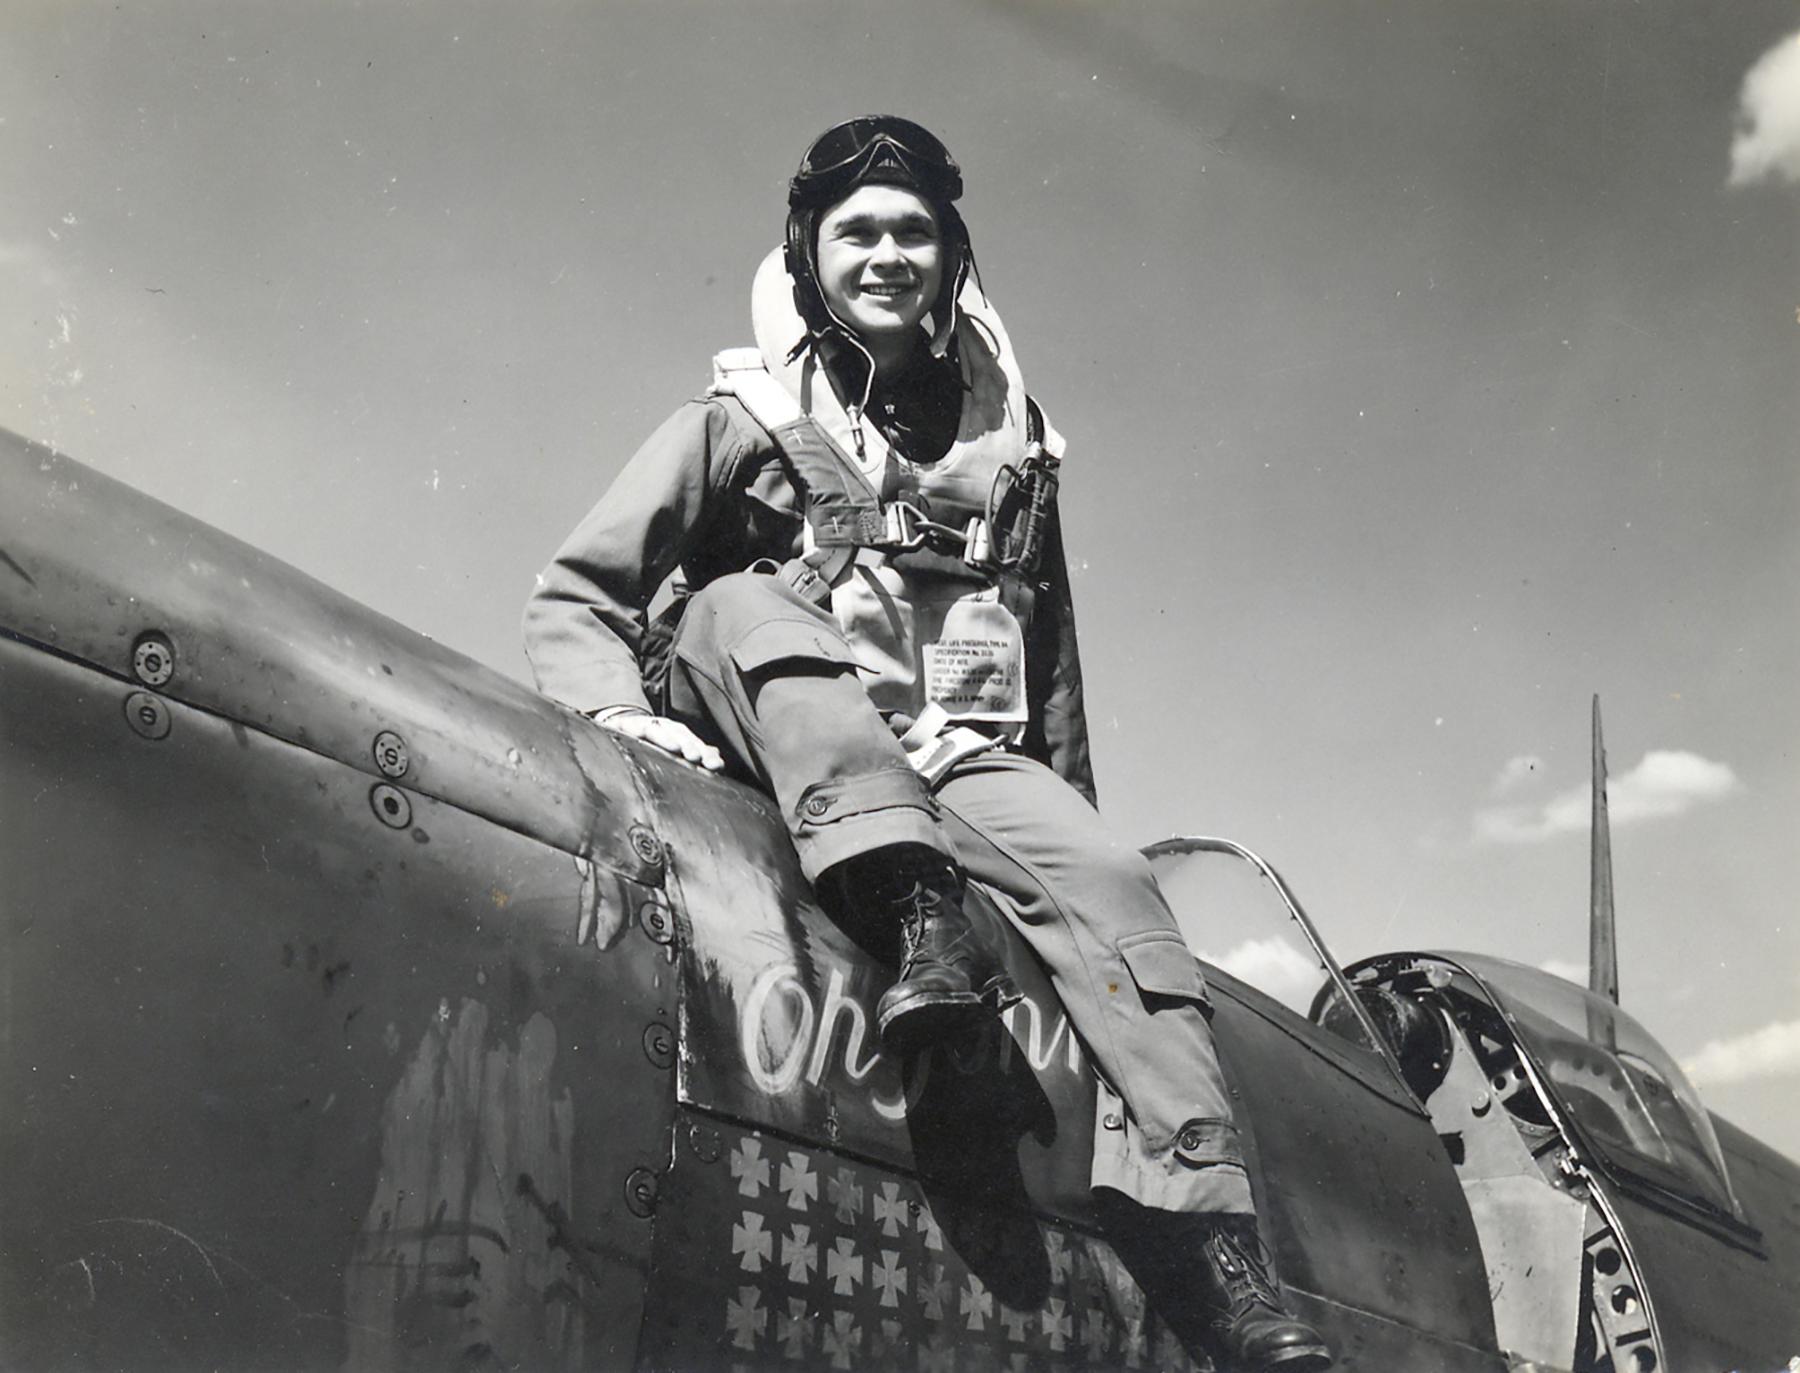 Spitfire PRXIT USAAF 7PRG Gerald Glaza Oh Johnnie MB948 England 1944 01